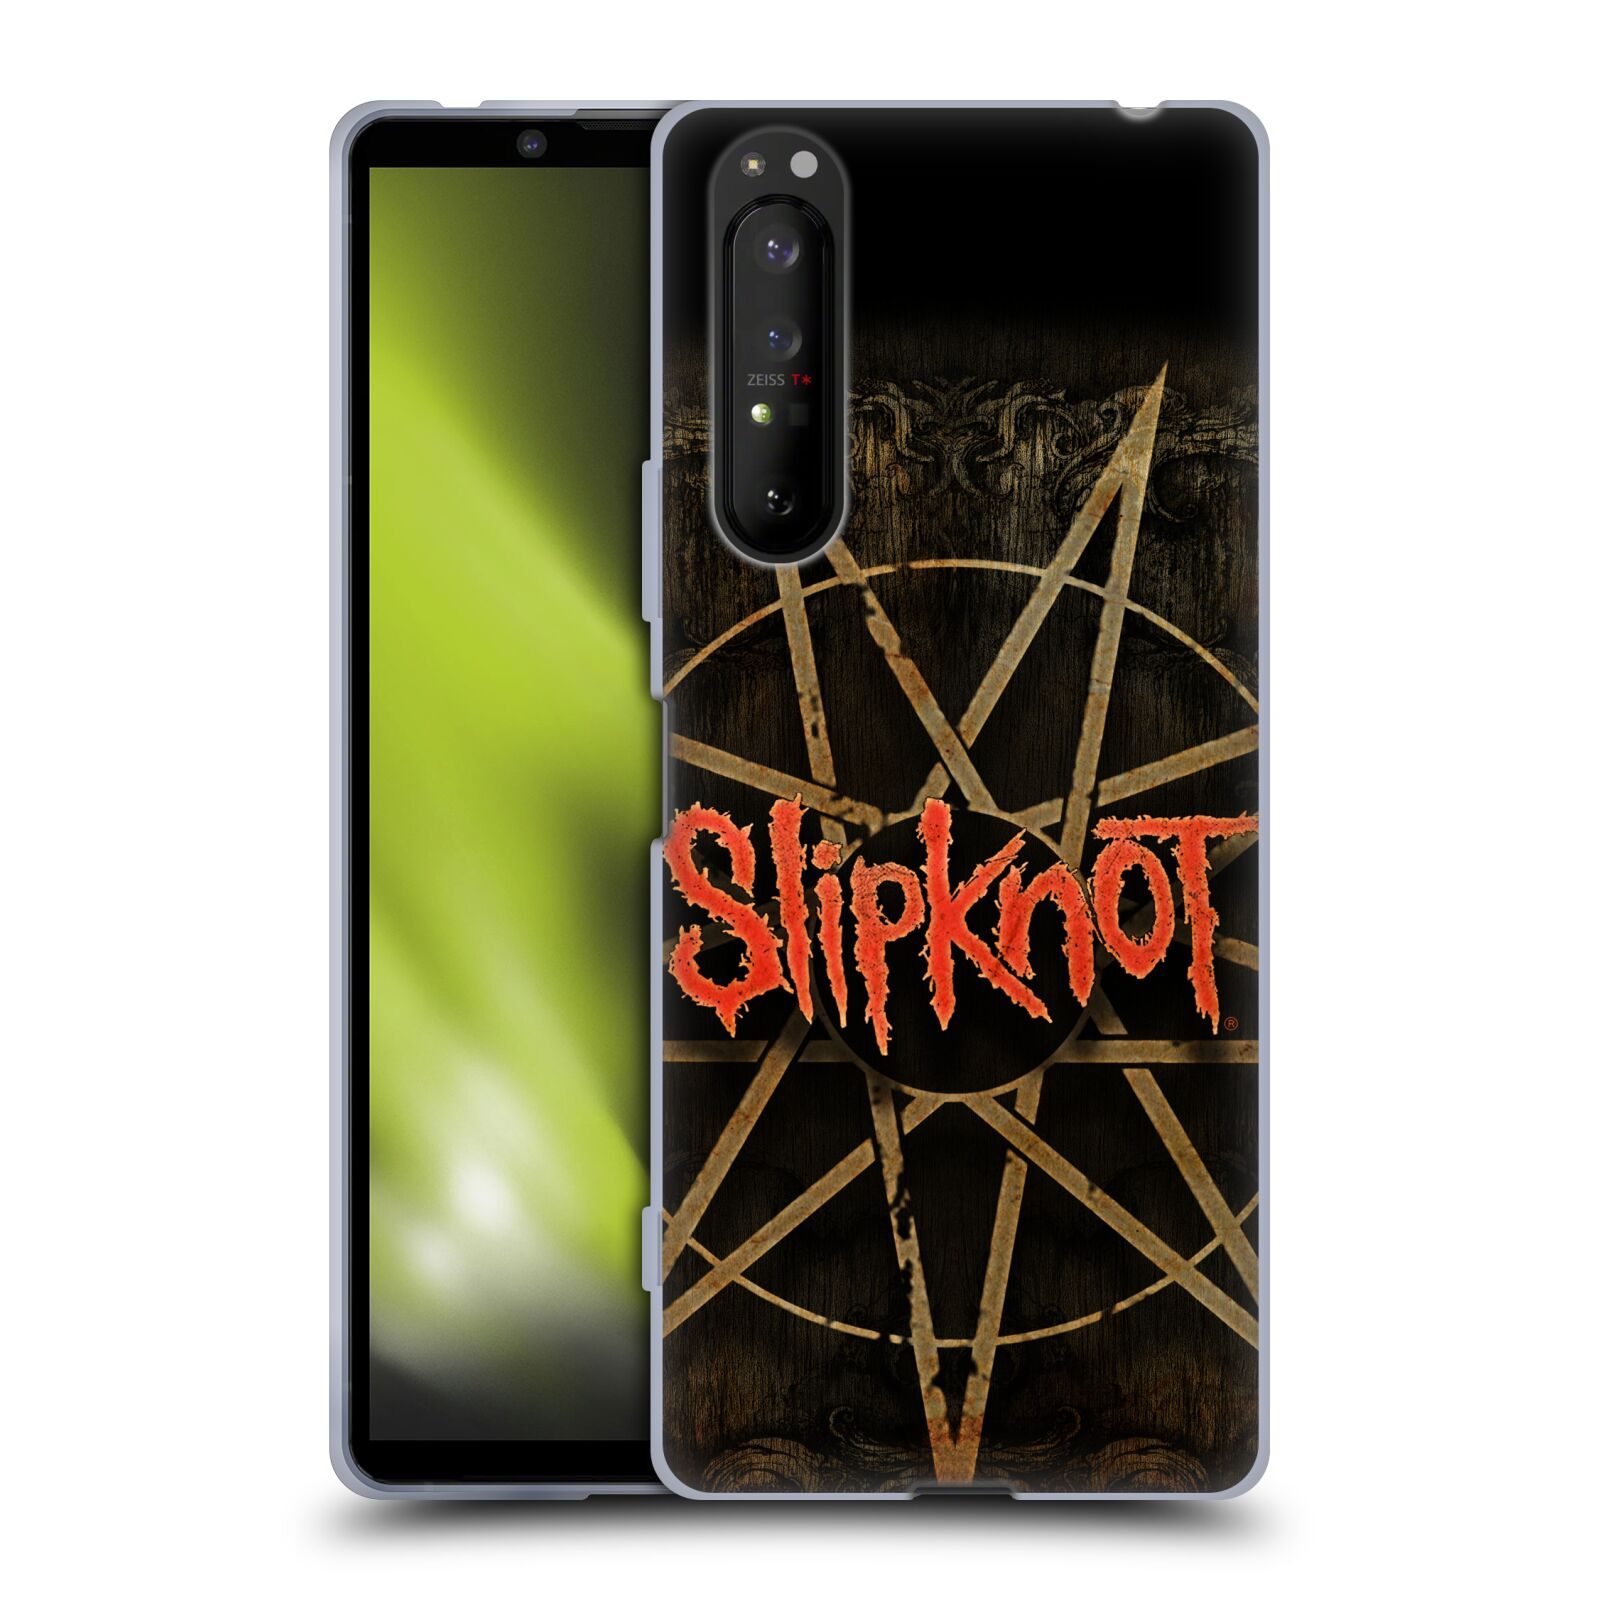 Silikonové pouzdro na mobil Sony Xperia 1 II - Head Case - Slipknot - Znak